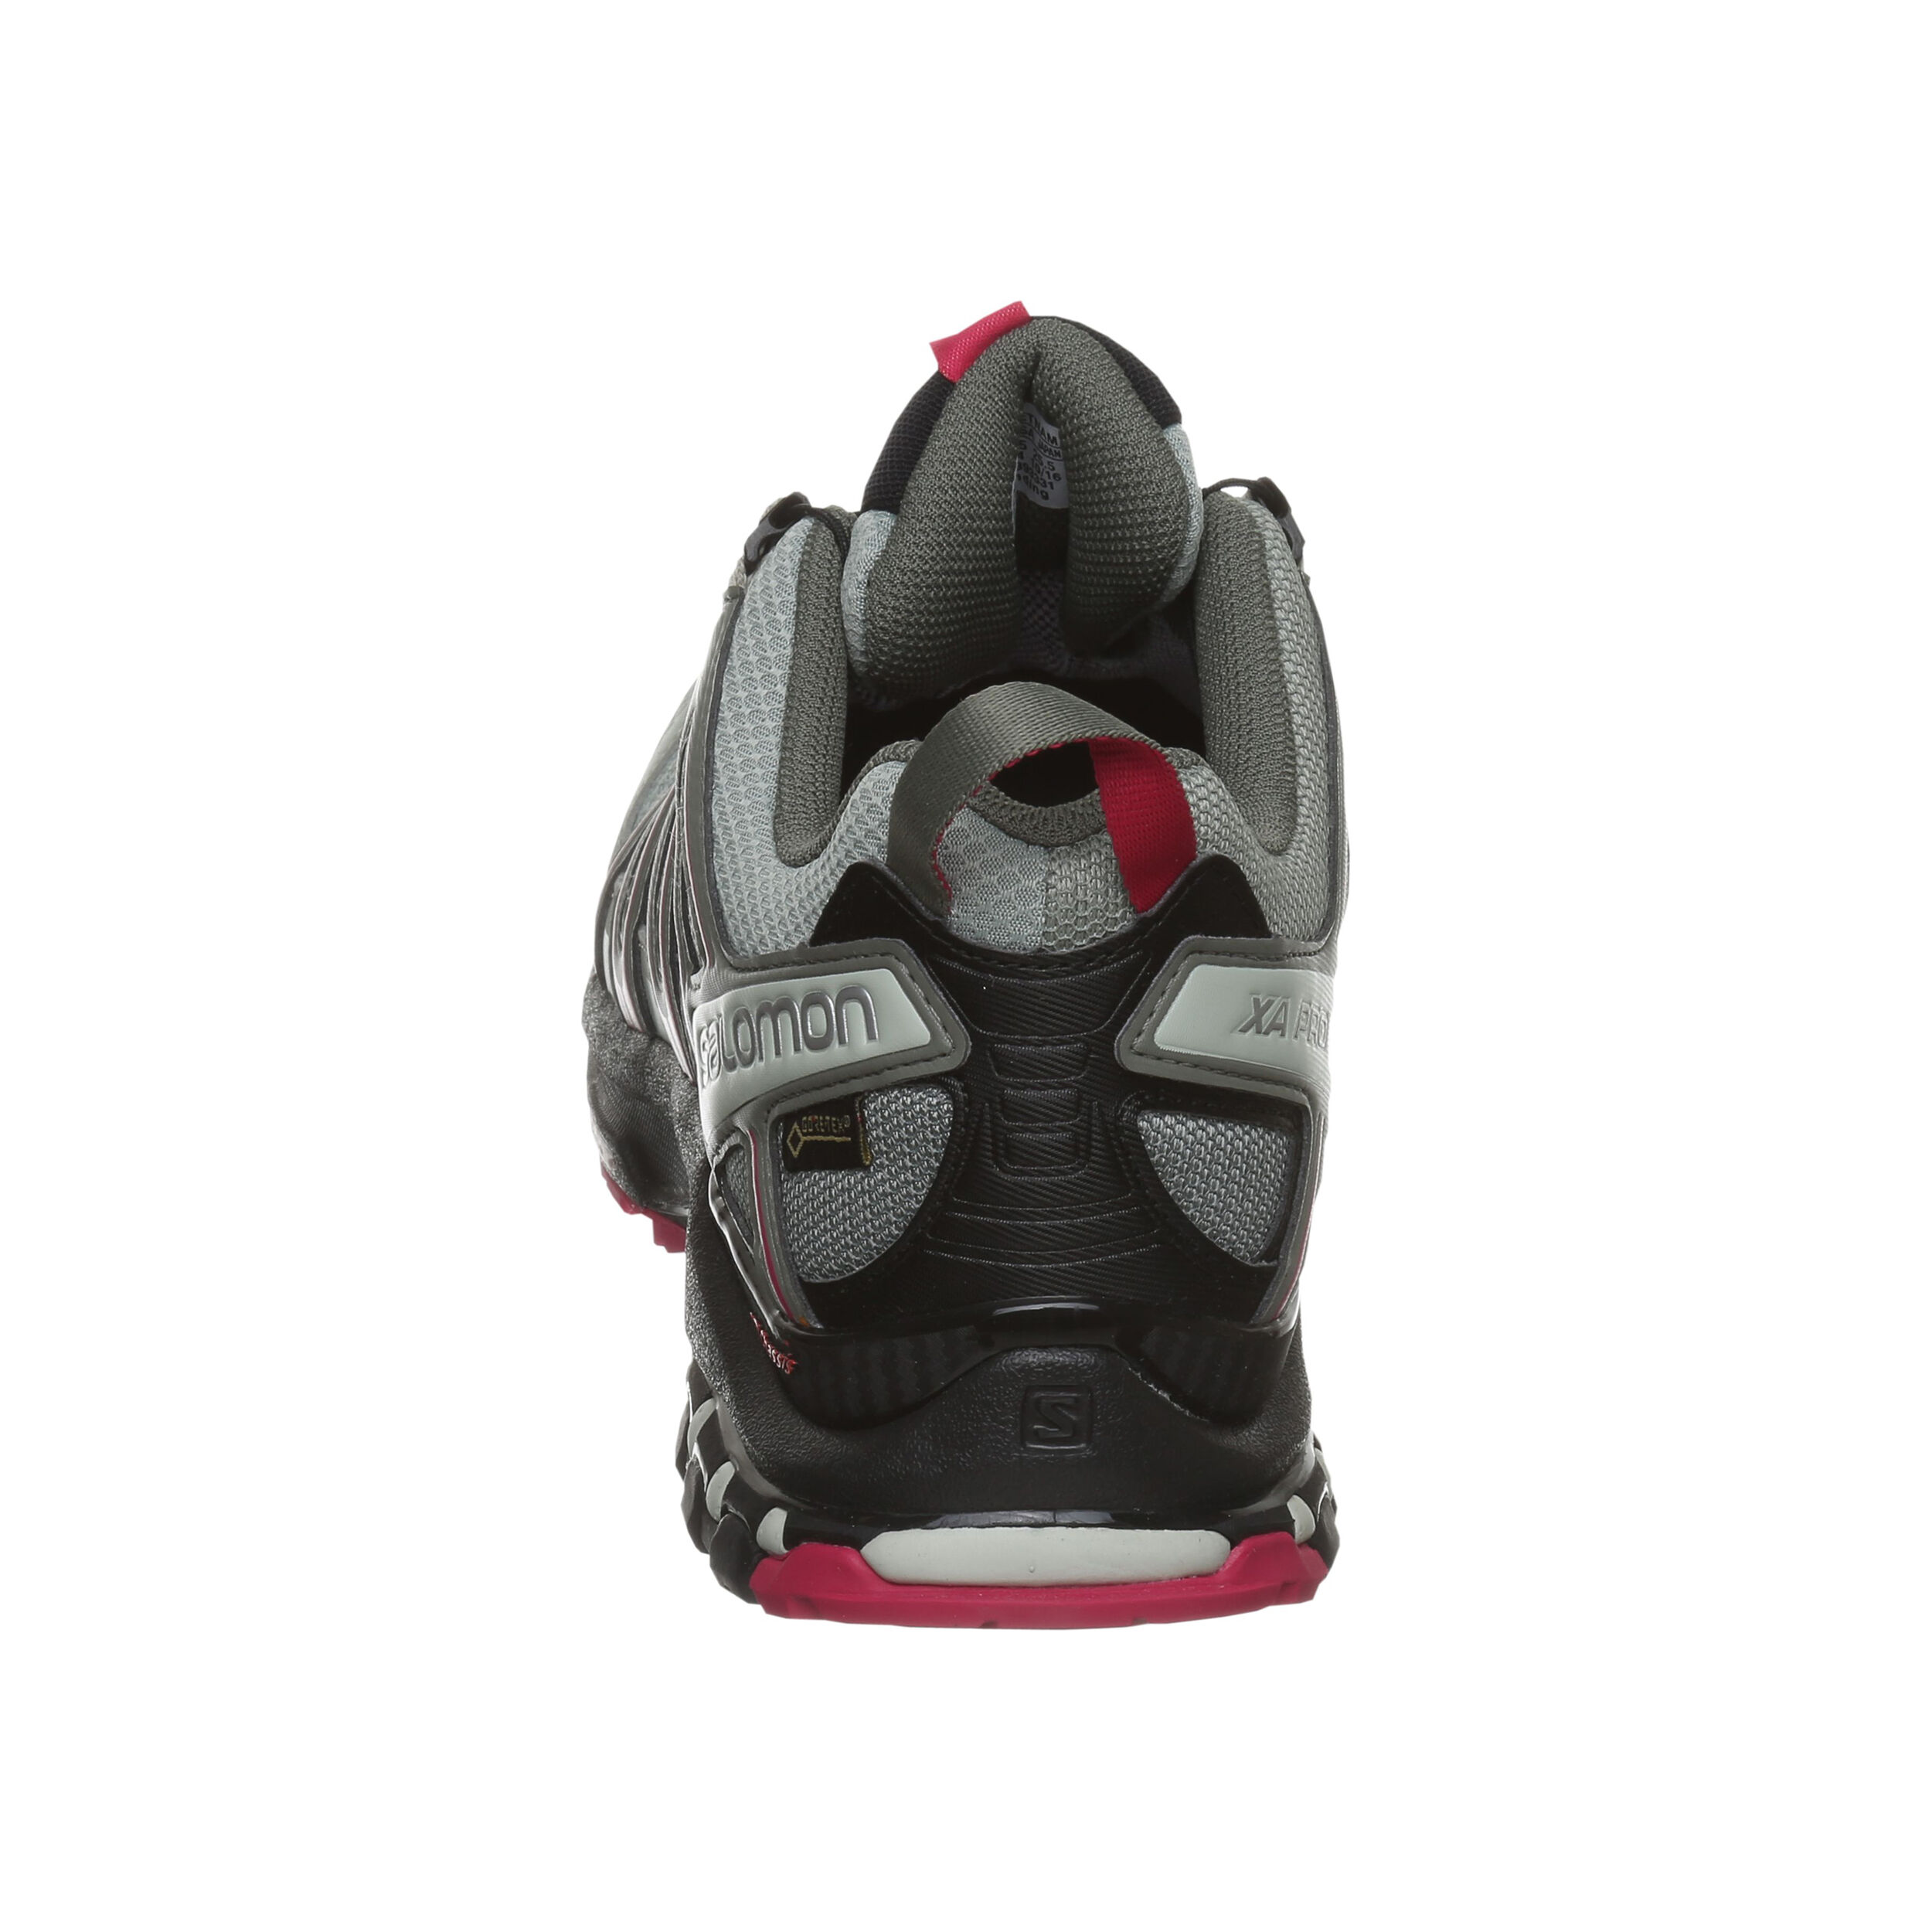 Salomon XA Pro 3D GTX Trailschuh Damen Hellgrau, Dunkelgrau